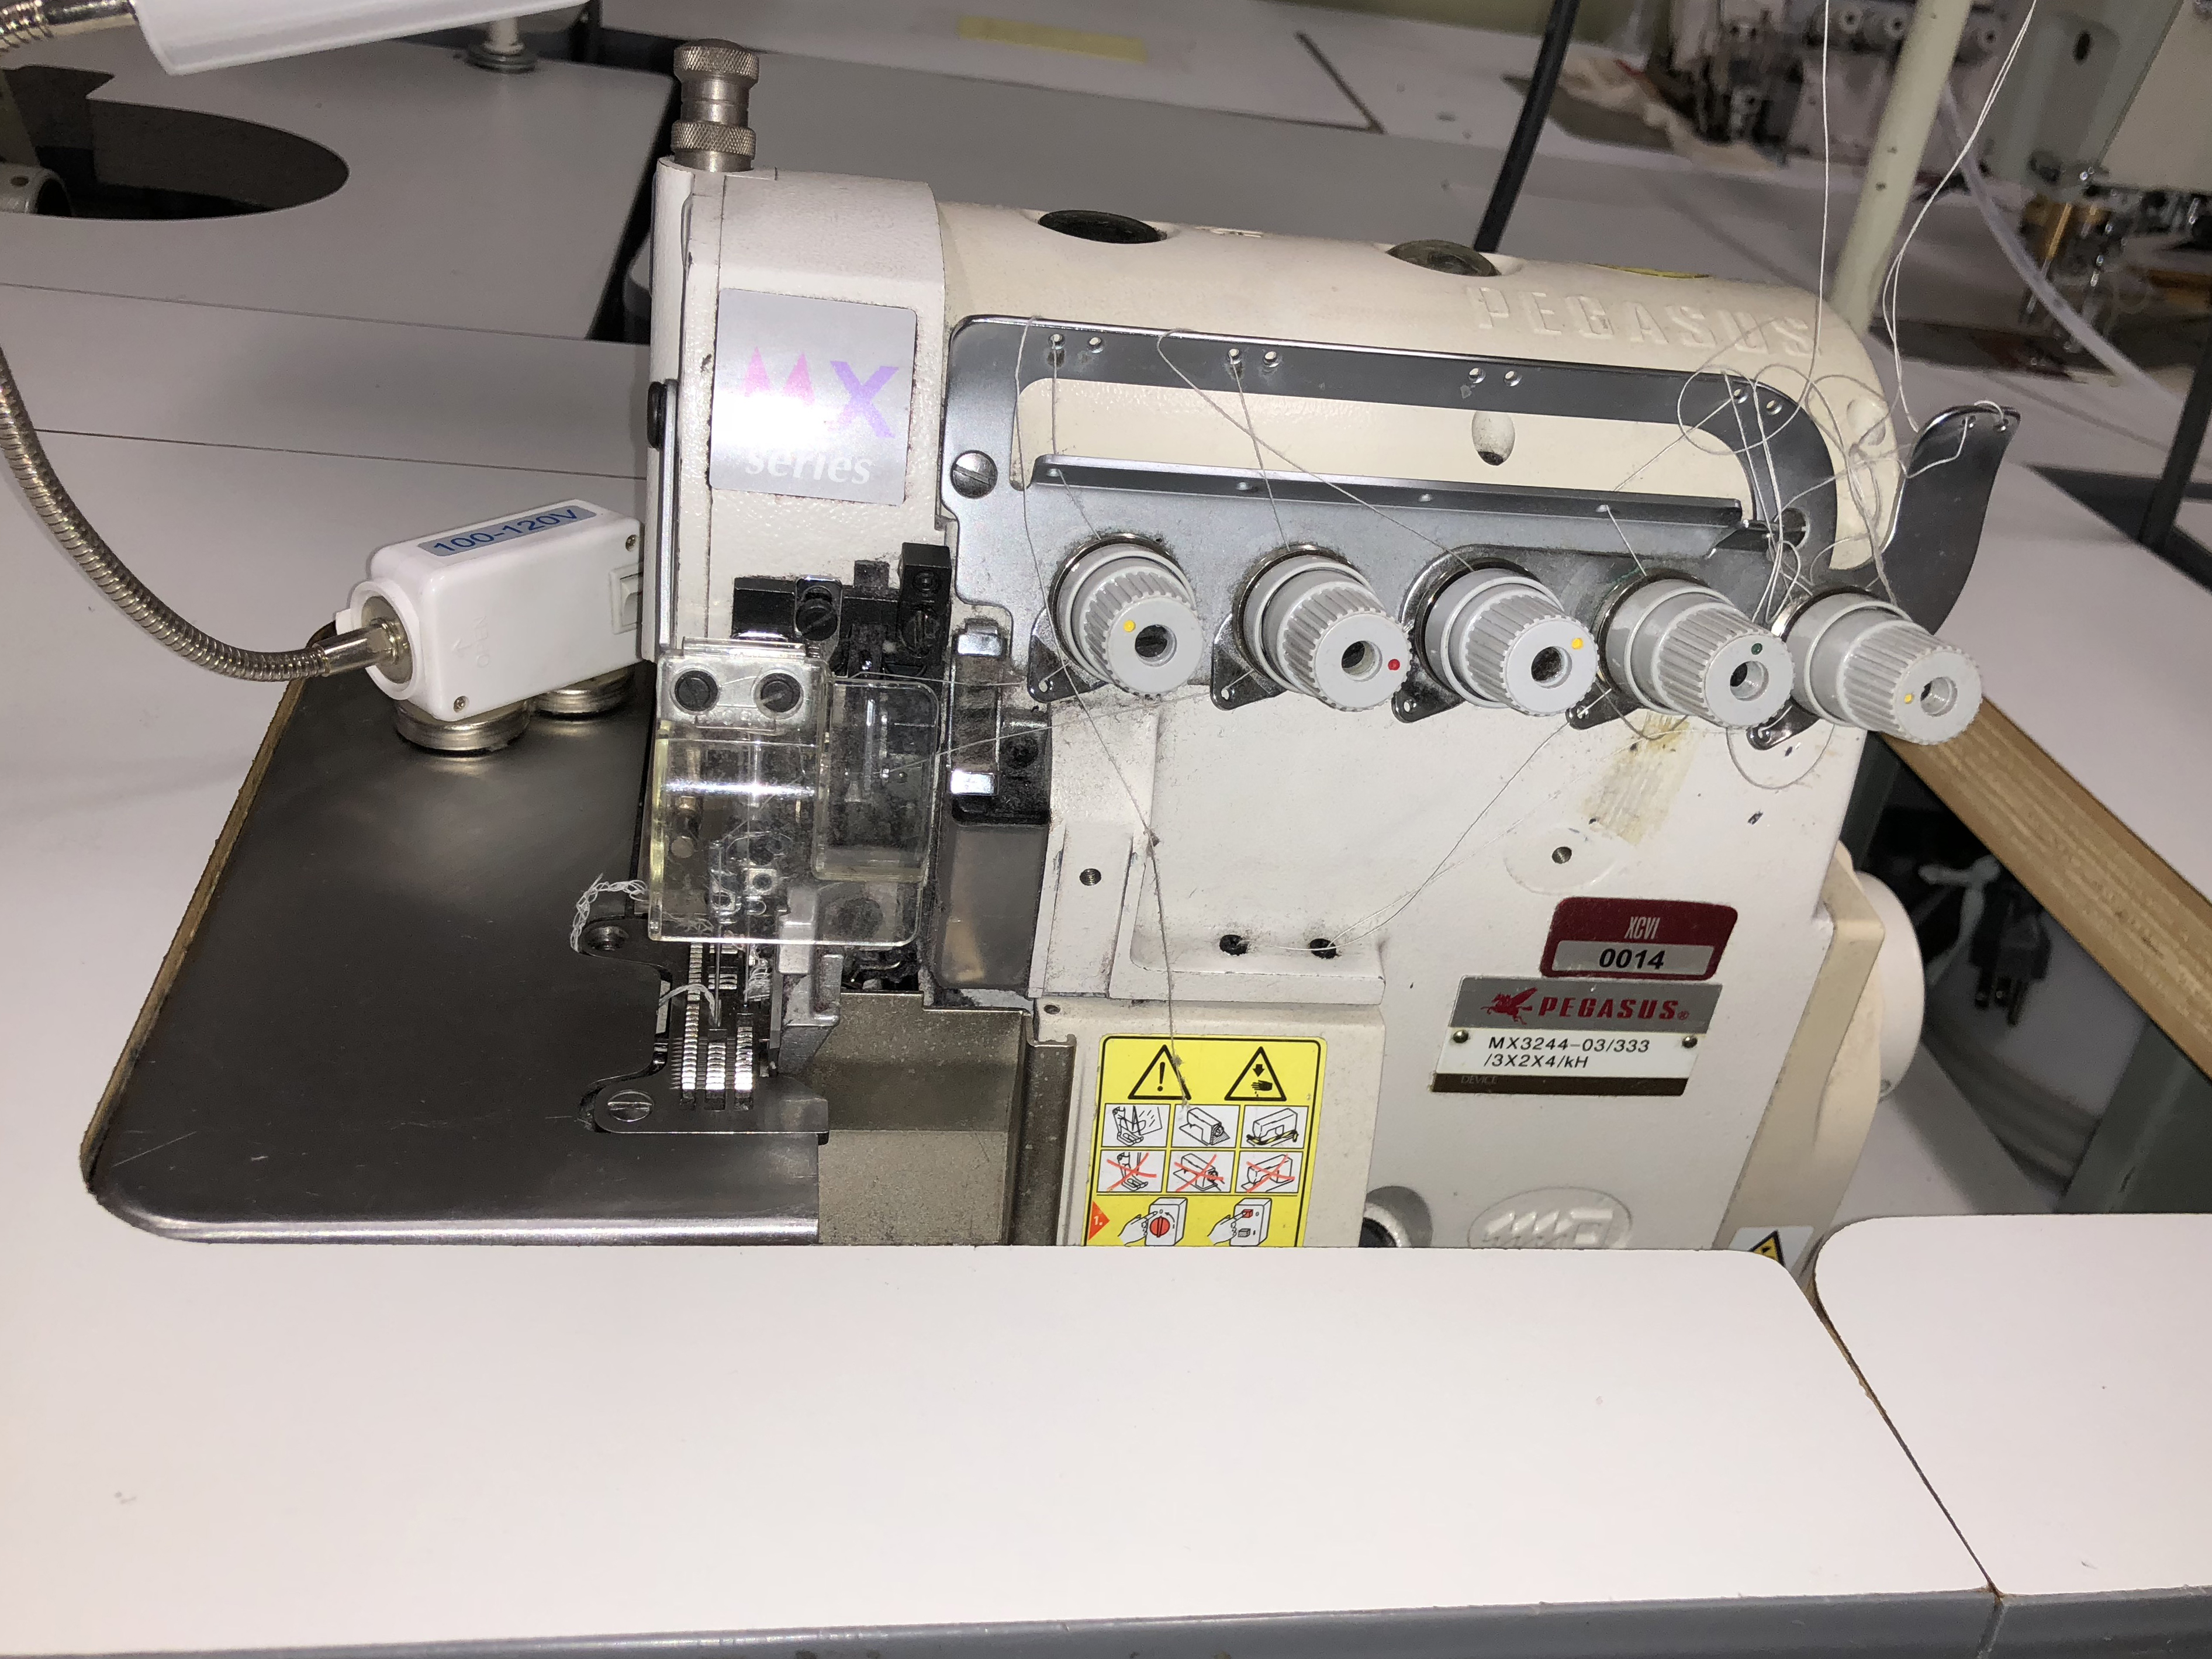 Pegasus MX3244-03/333 Overedger & safety stitch machine ...